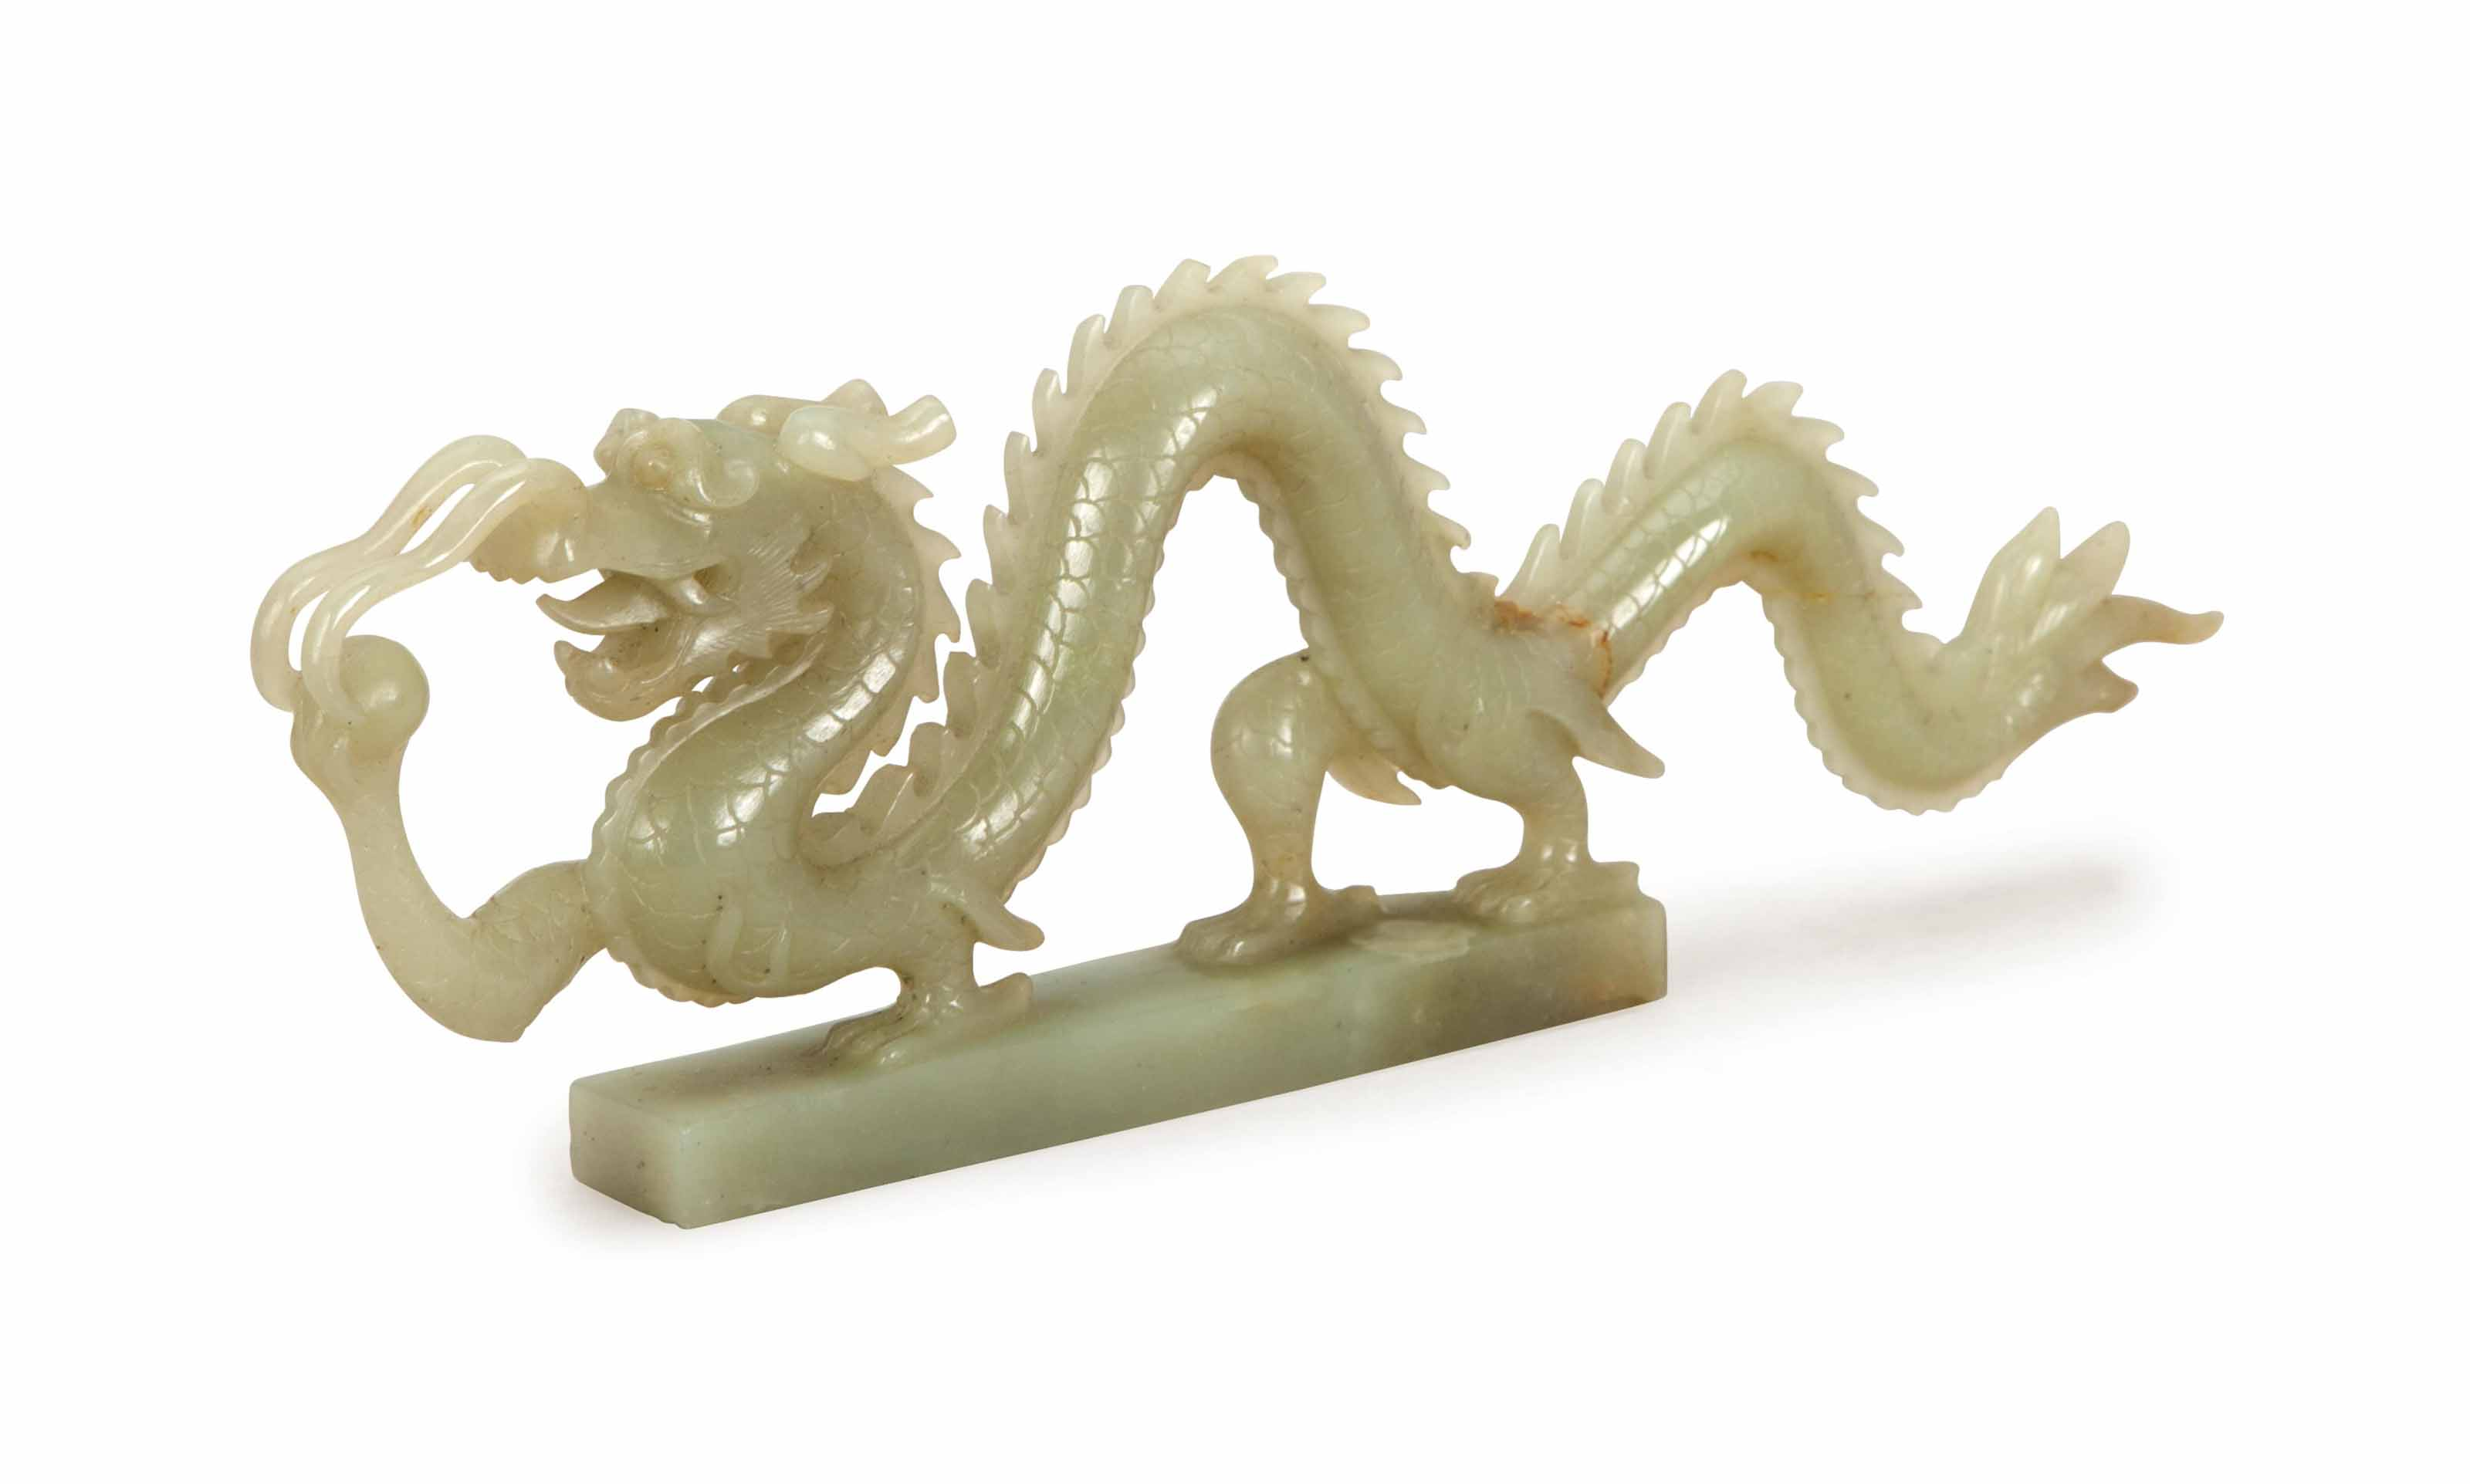 A CHINESE PALE GREEN JADE FIGU